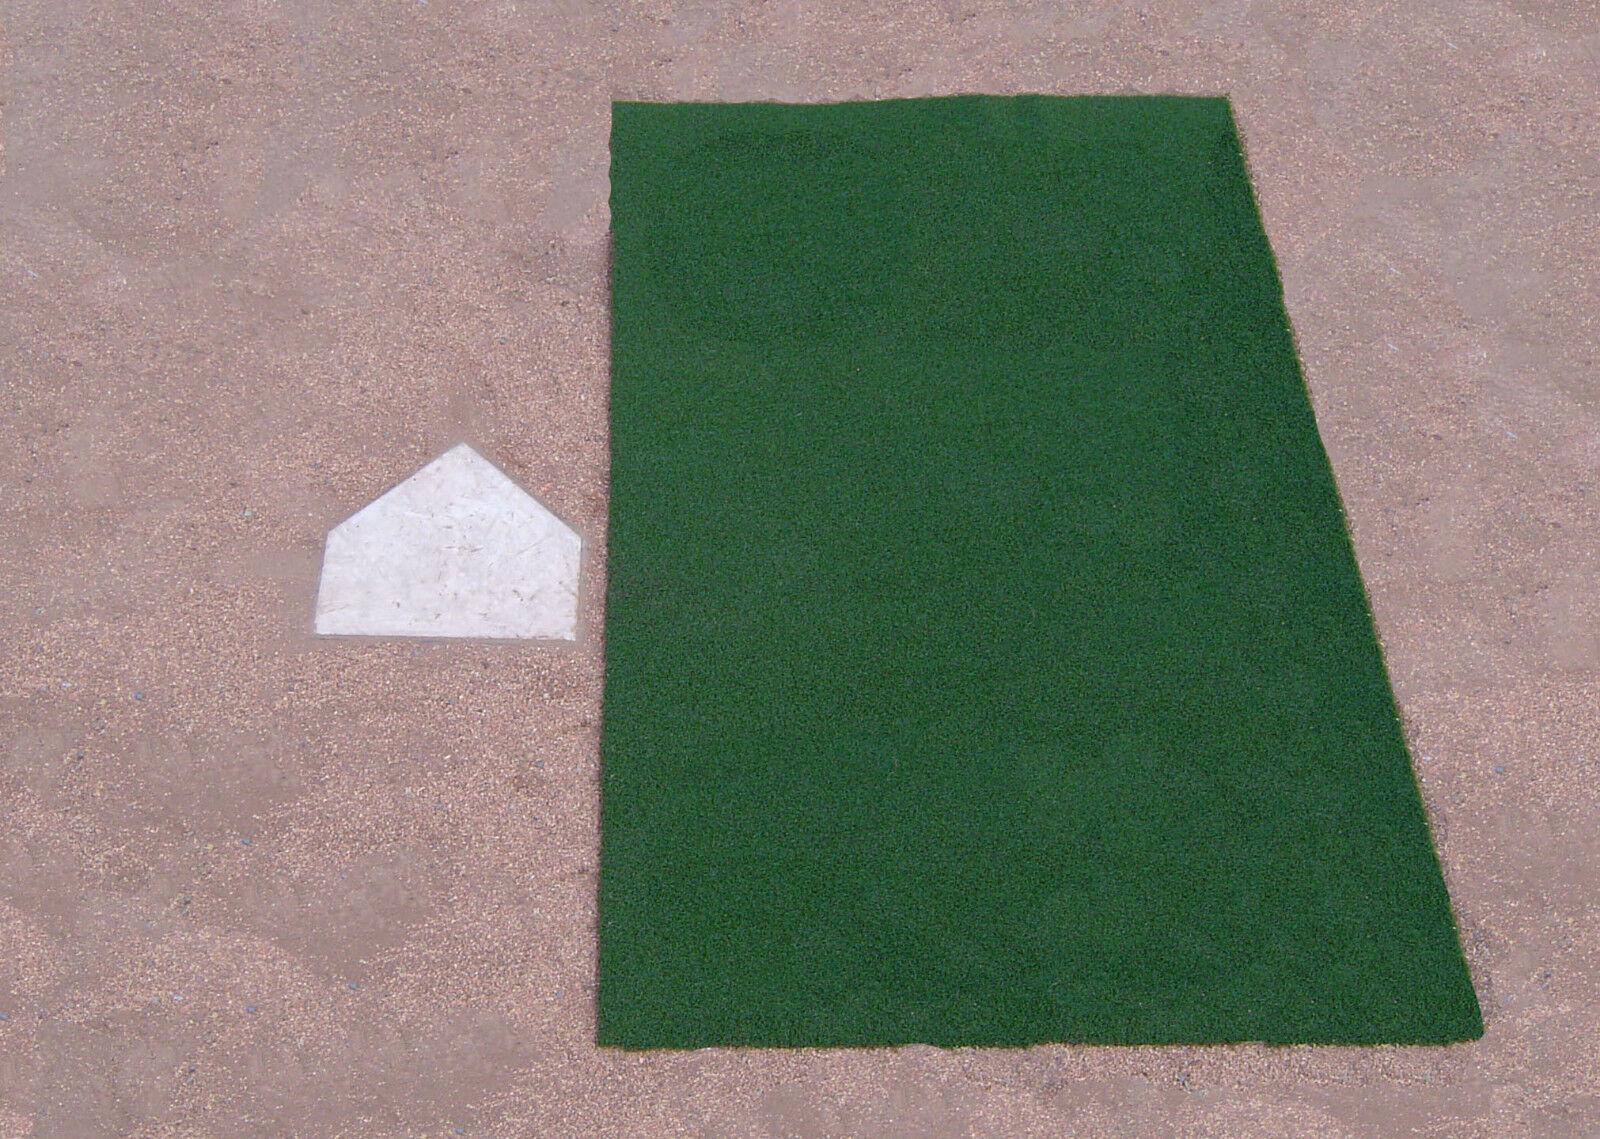 4' x 6' Green Baseball Softball Hitting Stance Batting Practice Cage Field Mat